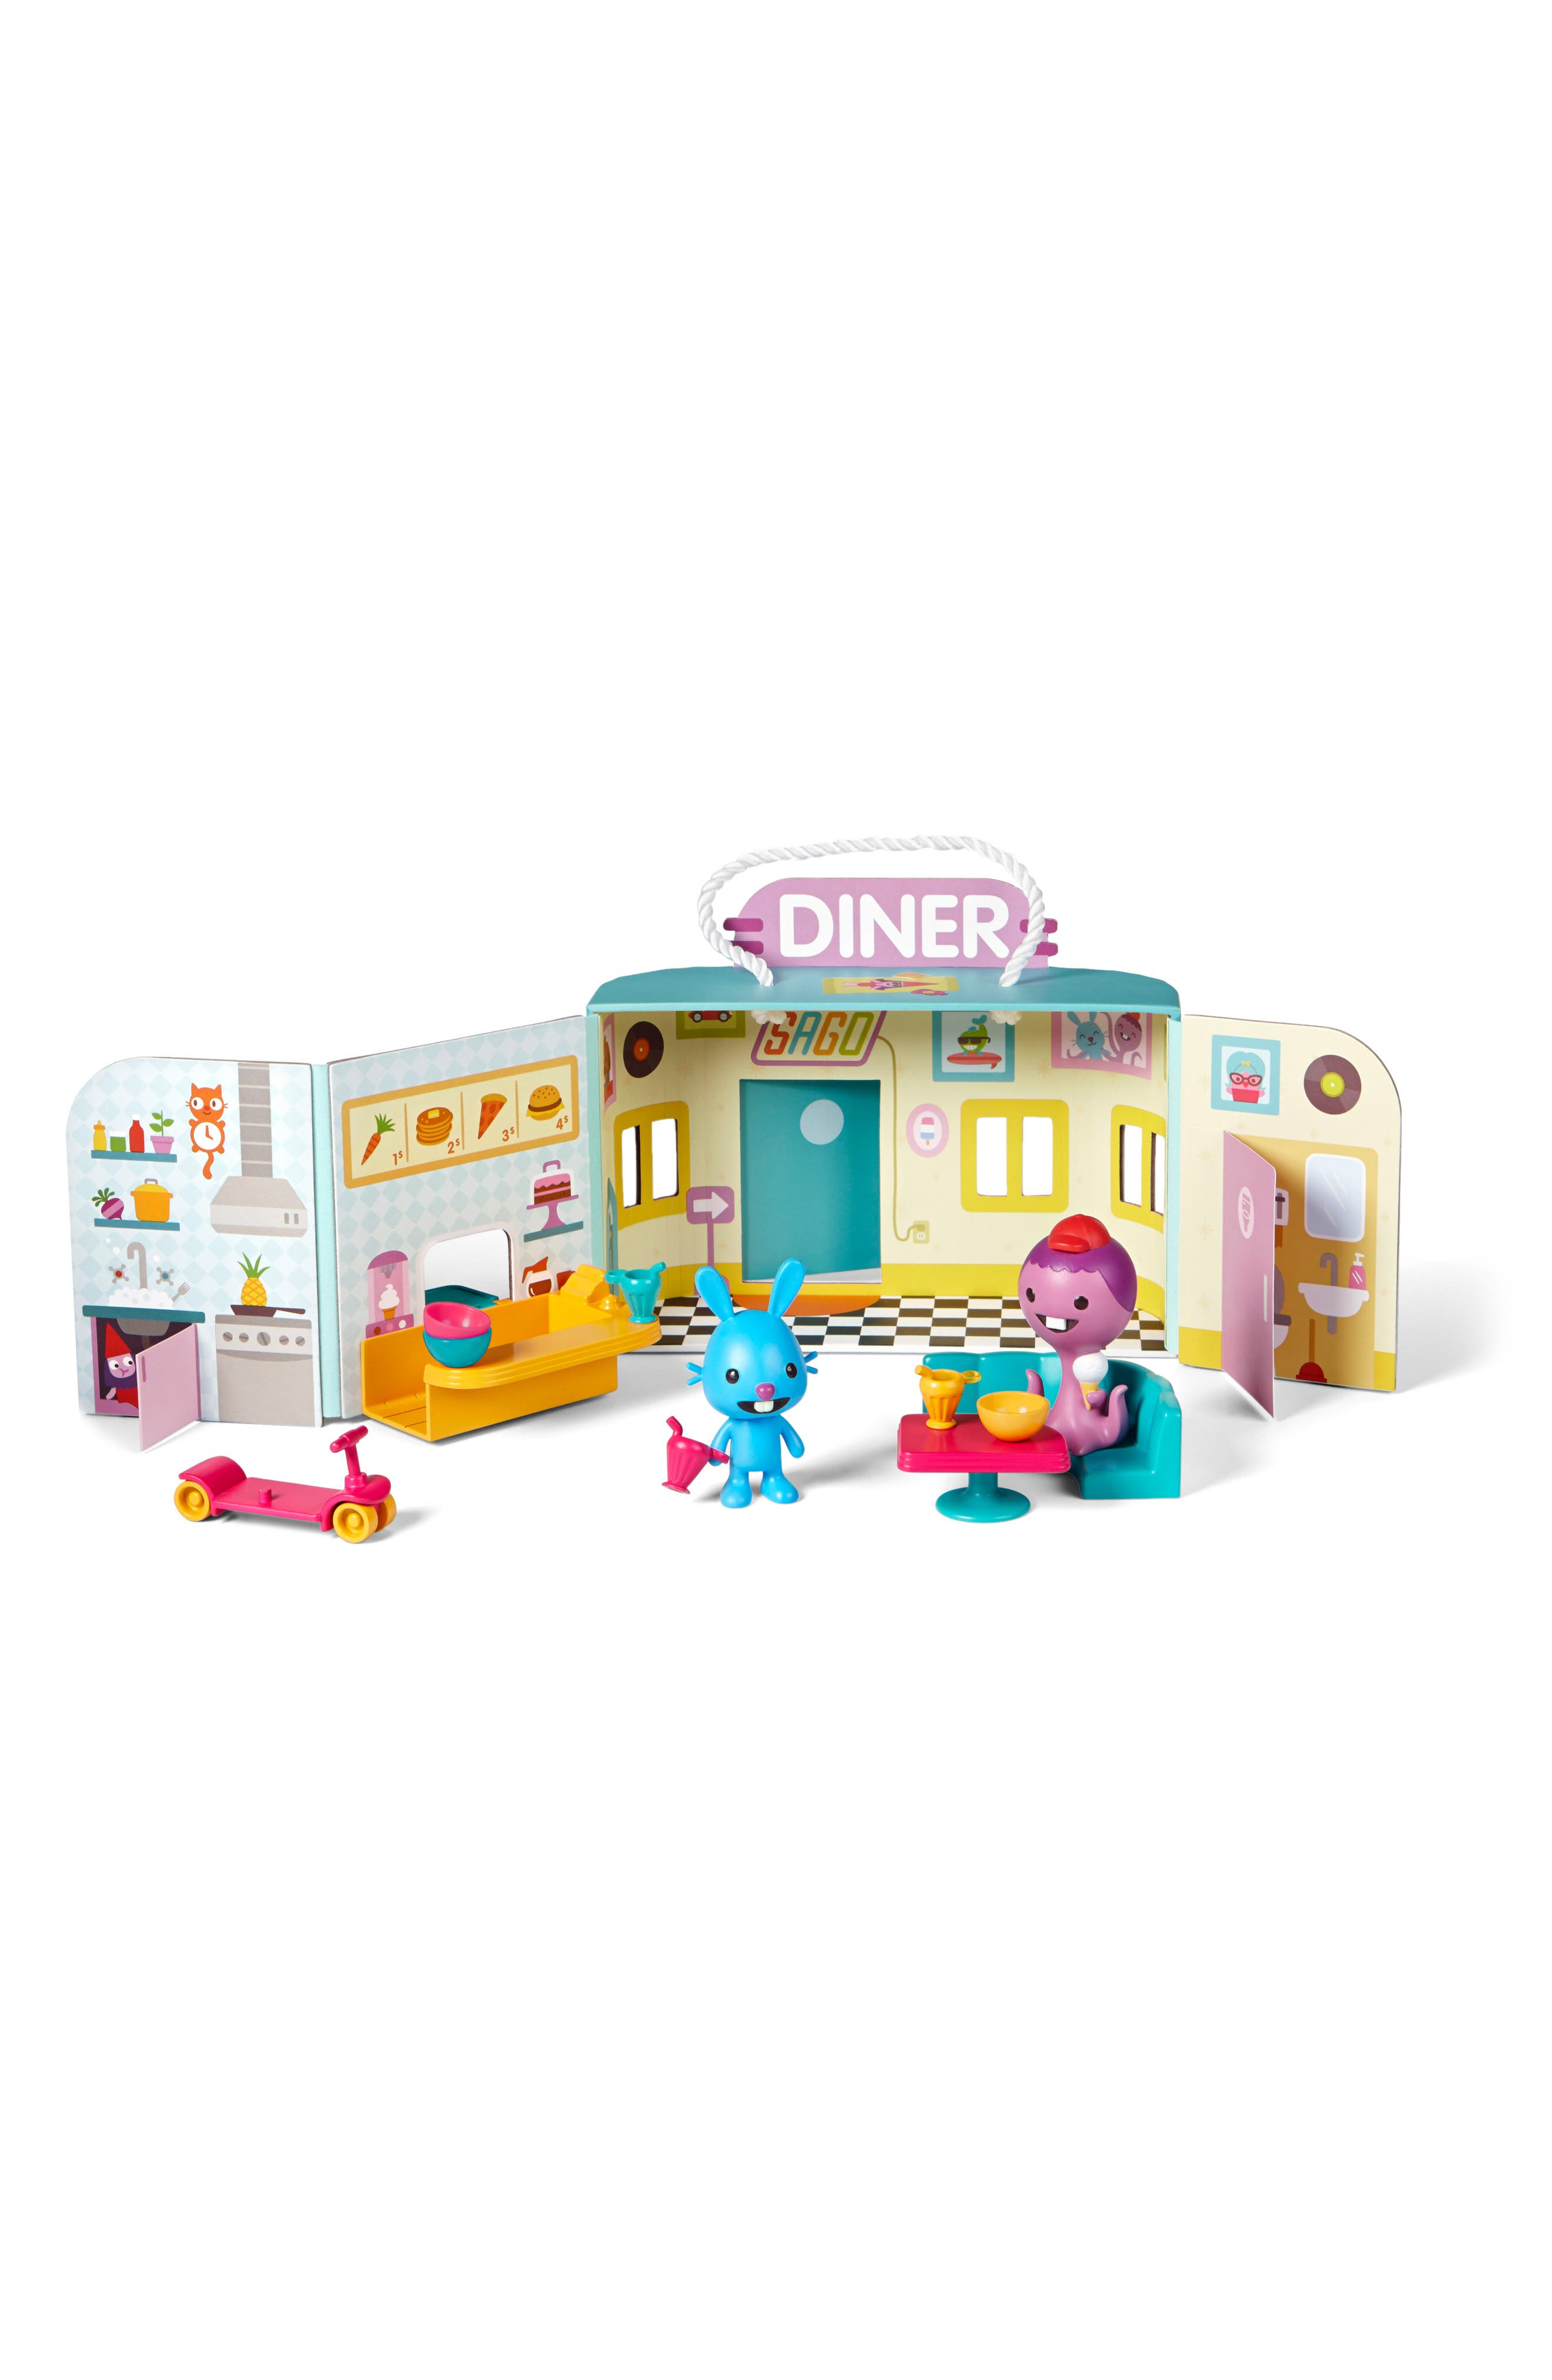 Jack's Diner Portable Play Set,                             Alternate thumbnail 3, color,                             MULTI